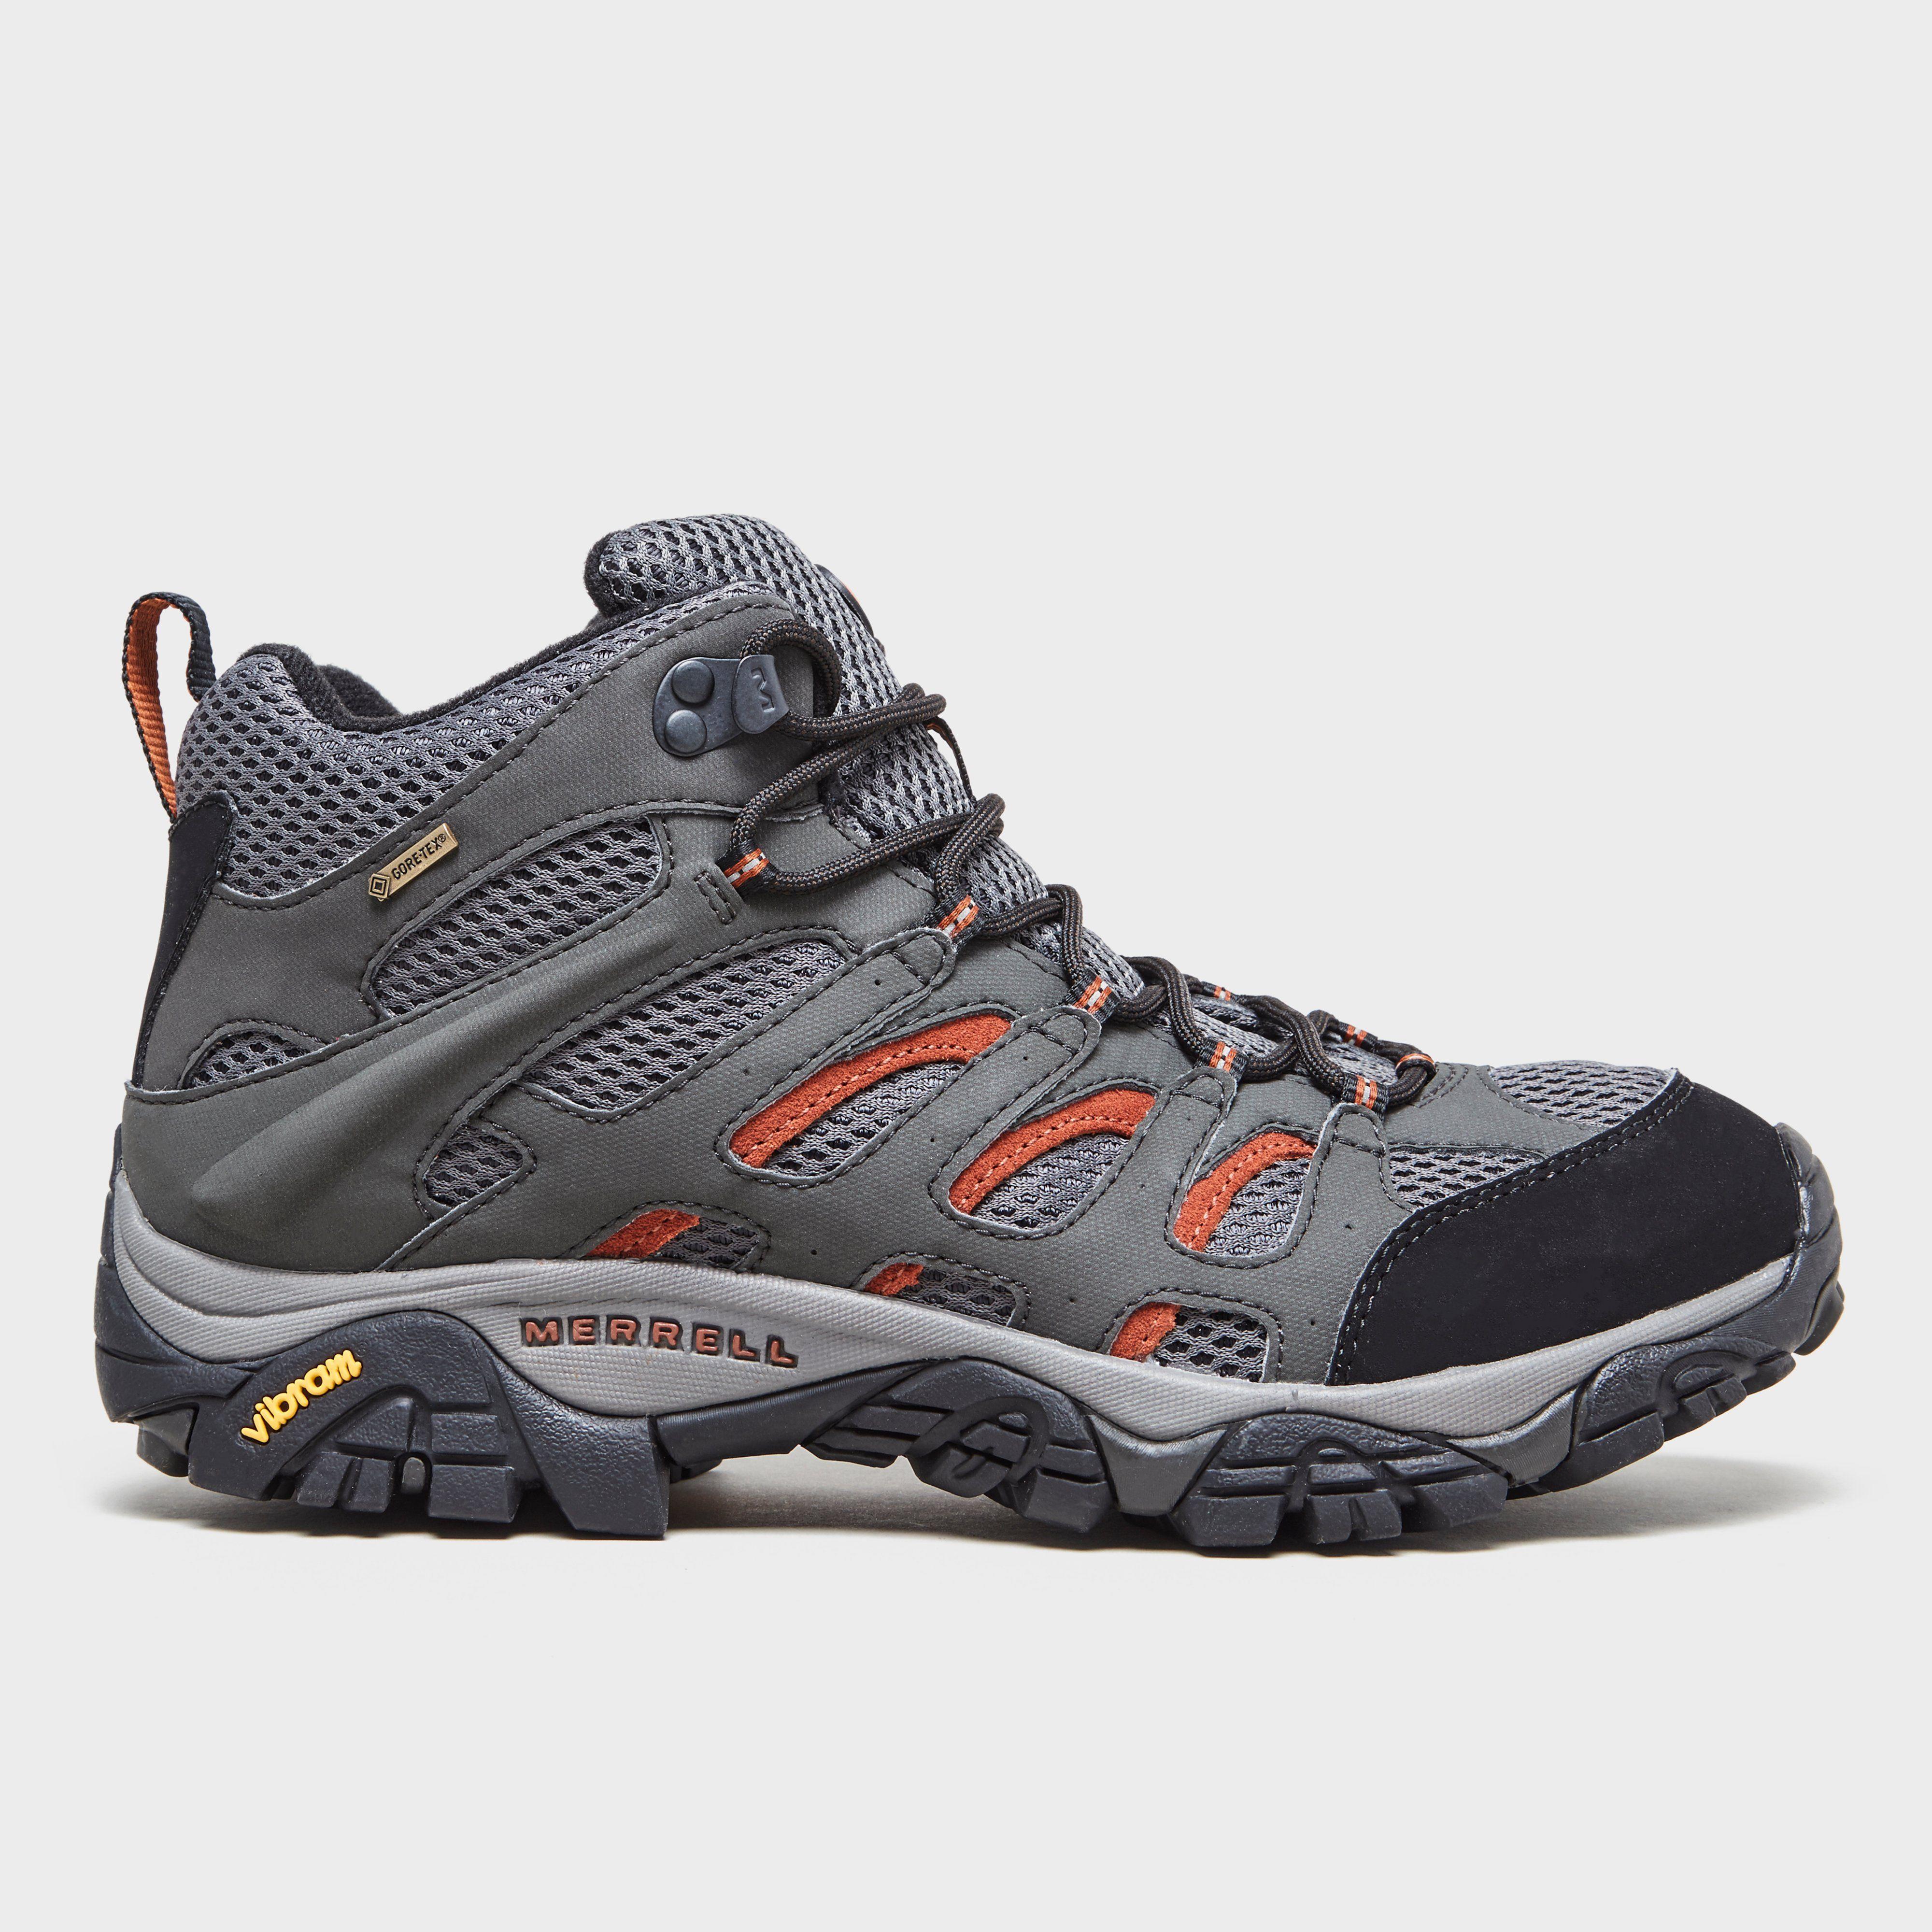 MERRELL Men's Moab Mid GORE-TEX® Hiking Boot